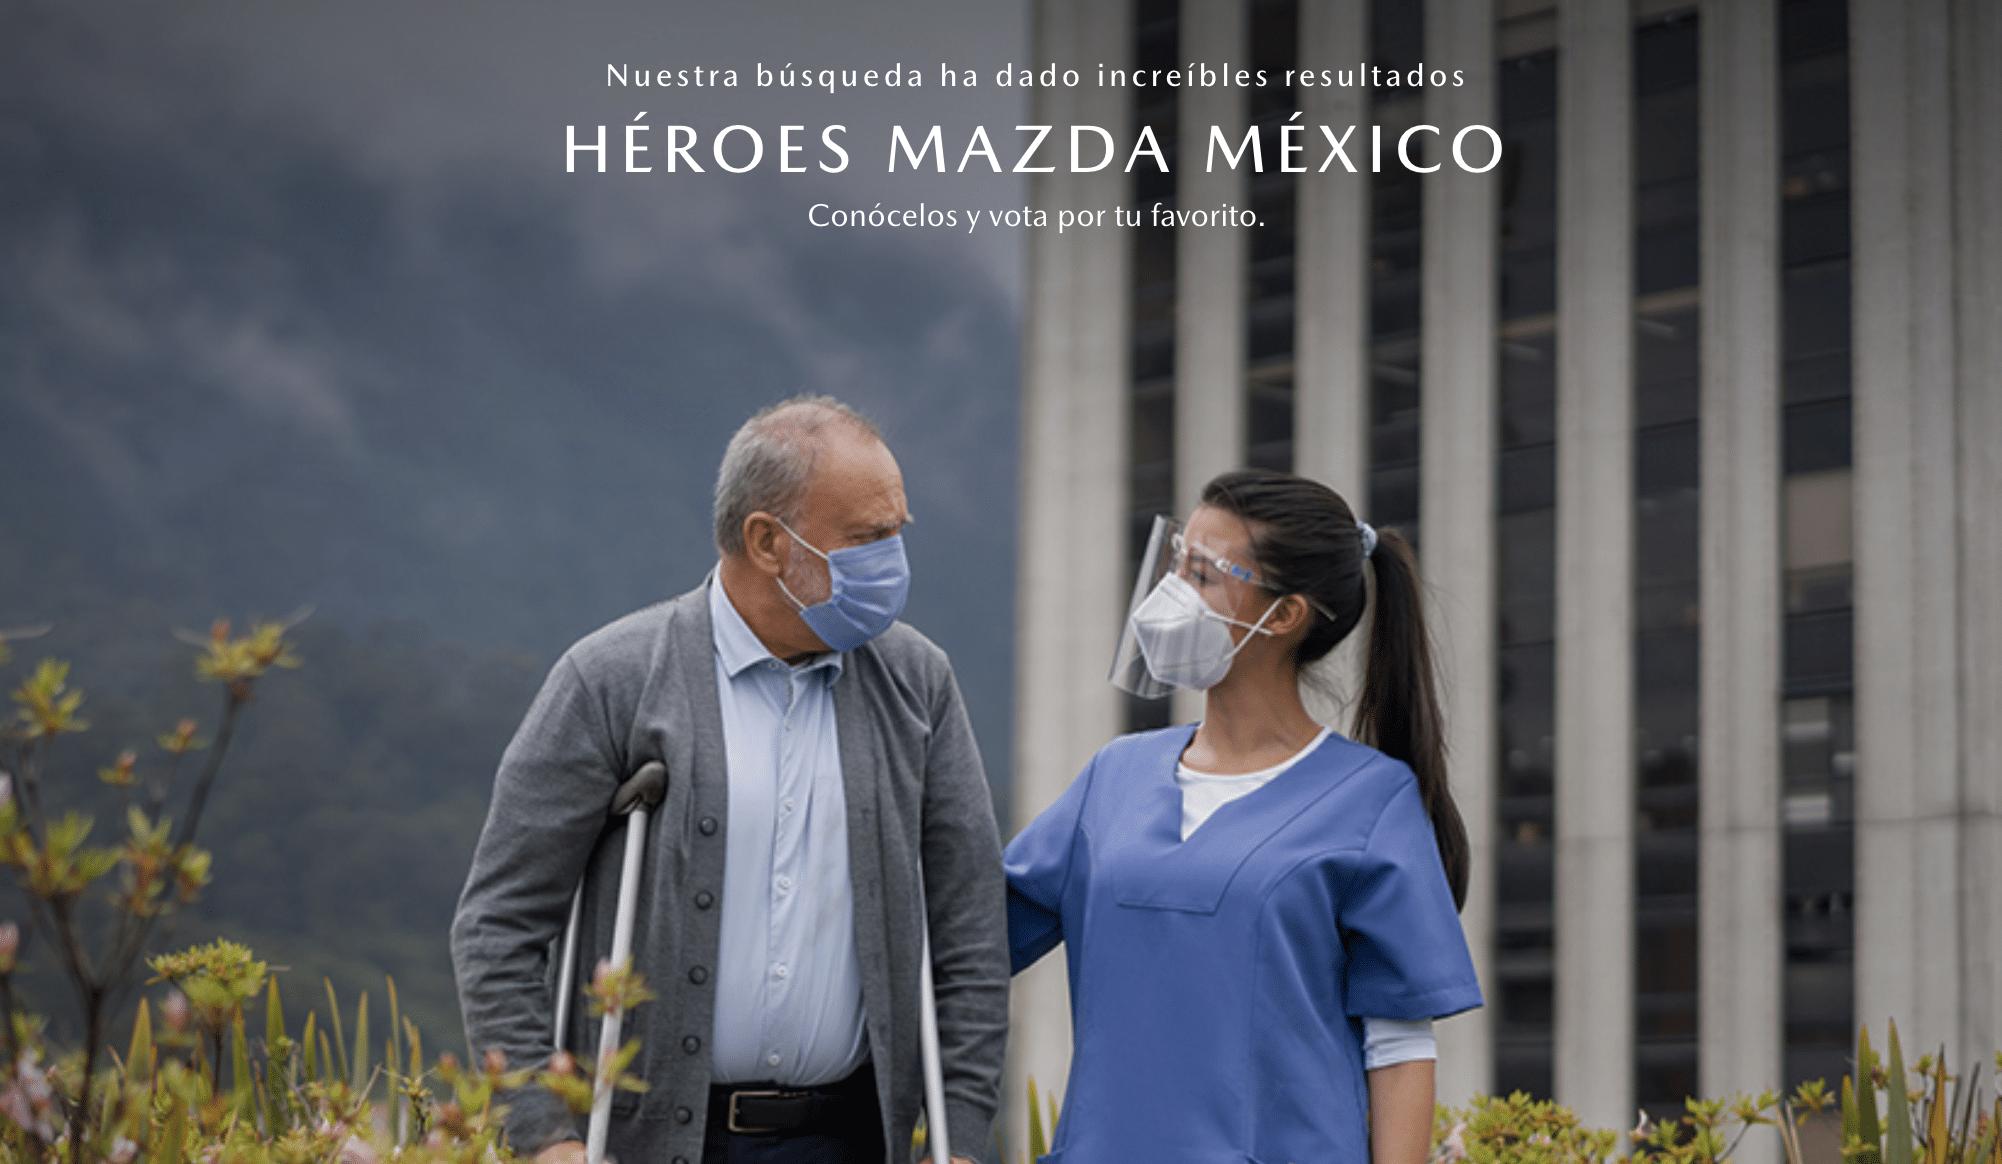 Conoce a cada finalista #HéroesMazdaMéxico: 10 historias de esperanza